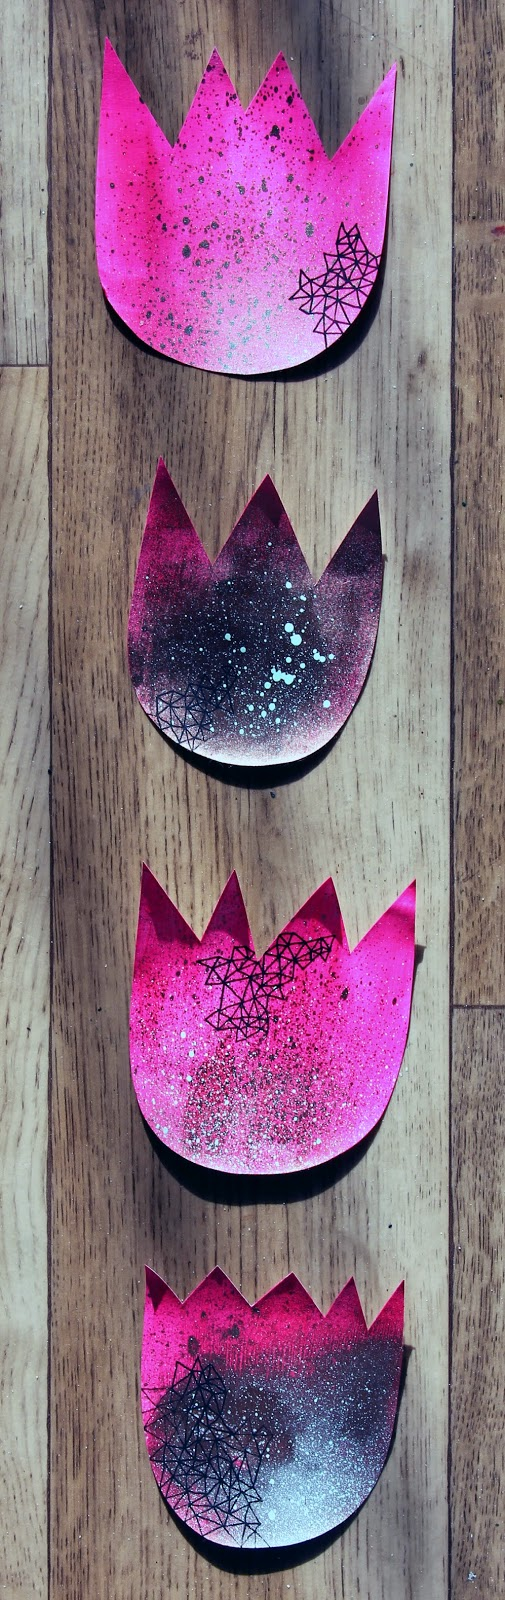 Tulpenpink via dorette